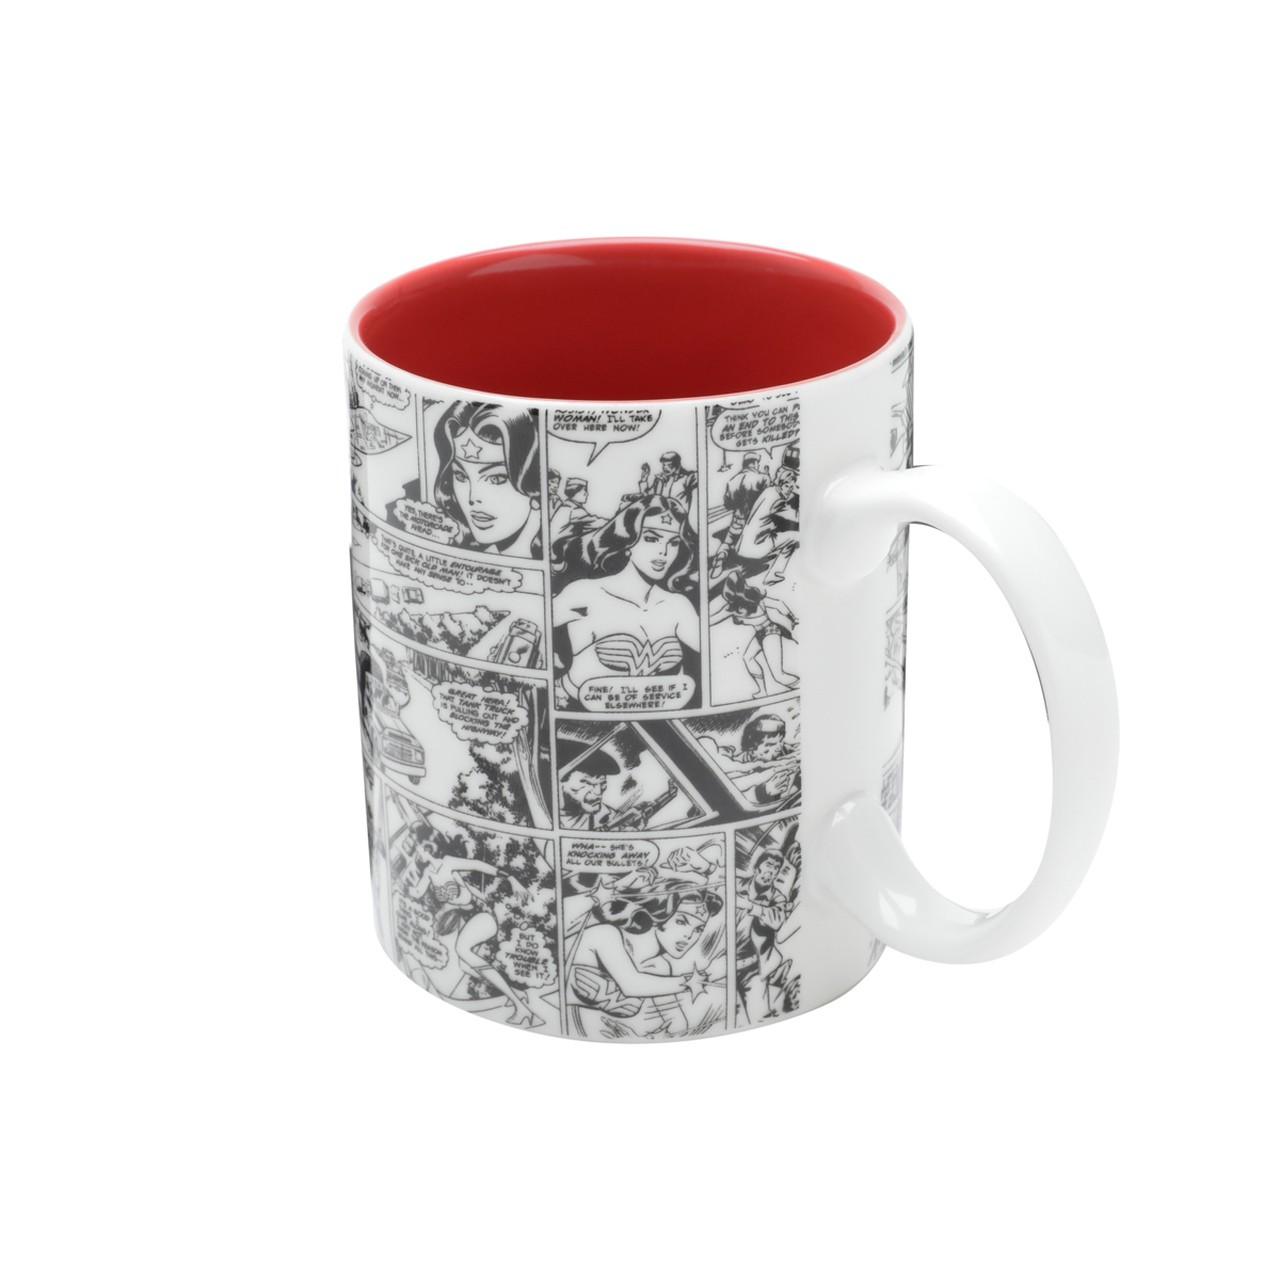 Caneca de Porcelana: Mulher Maravilha Colorido ( Wonder Woman) Dc Comics